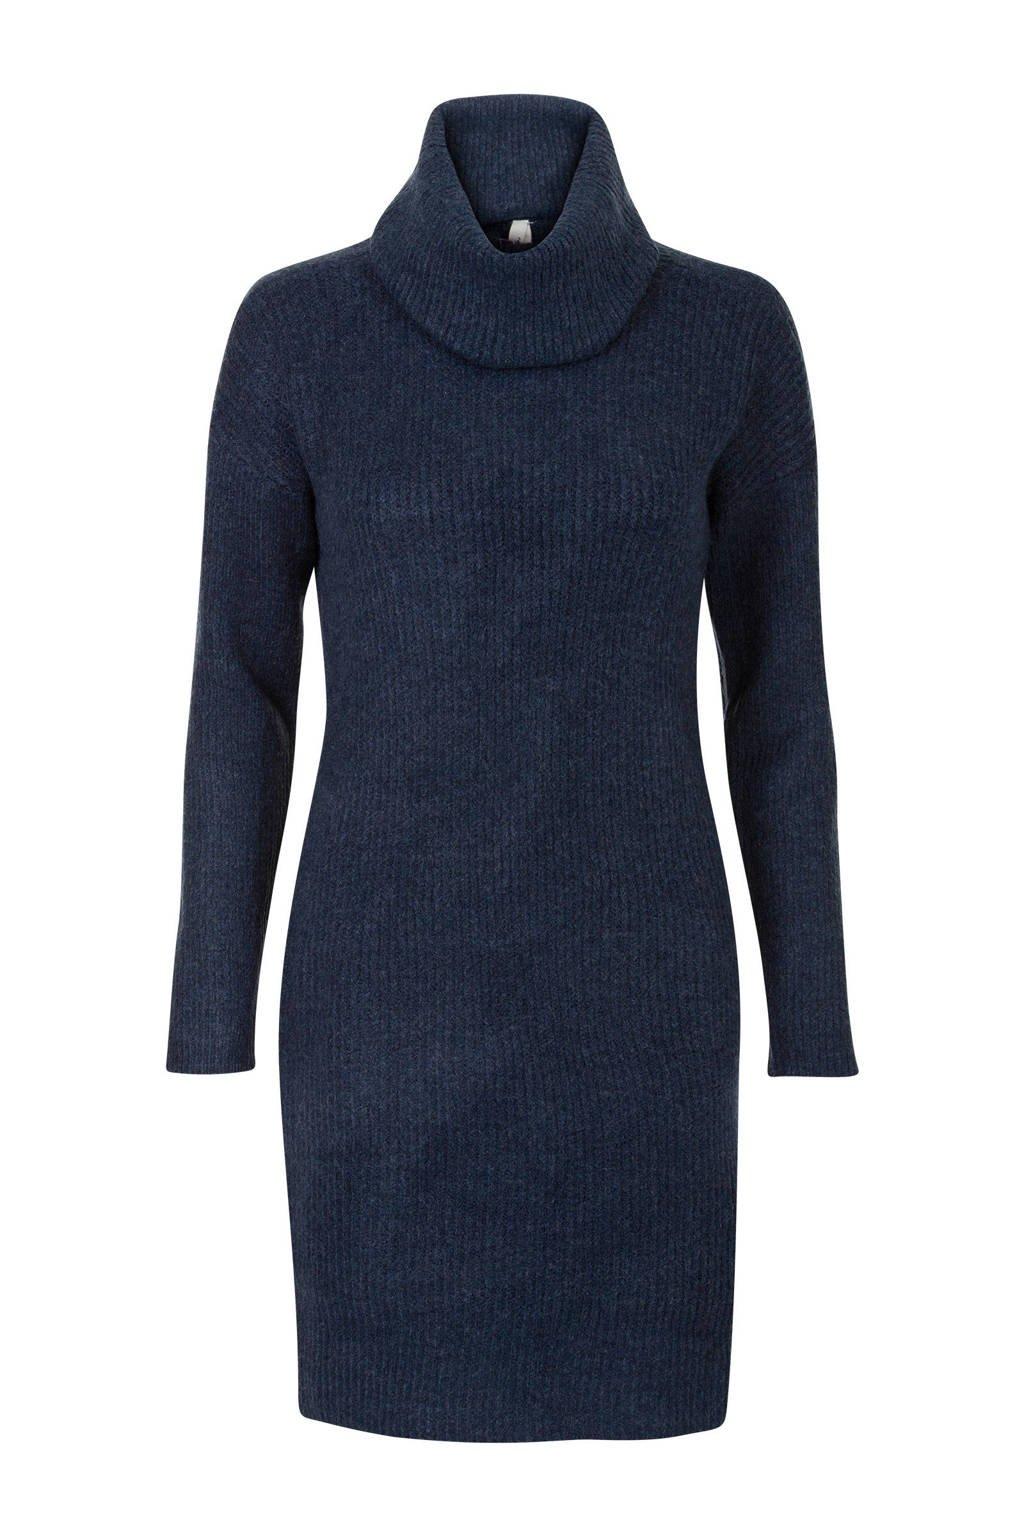 Miss Etam Regulier jurk met col donkerblauw, Blauw